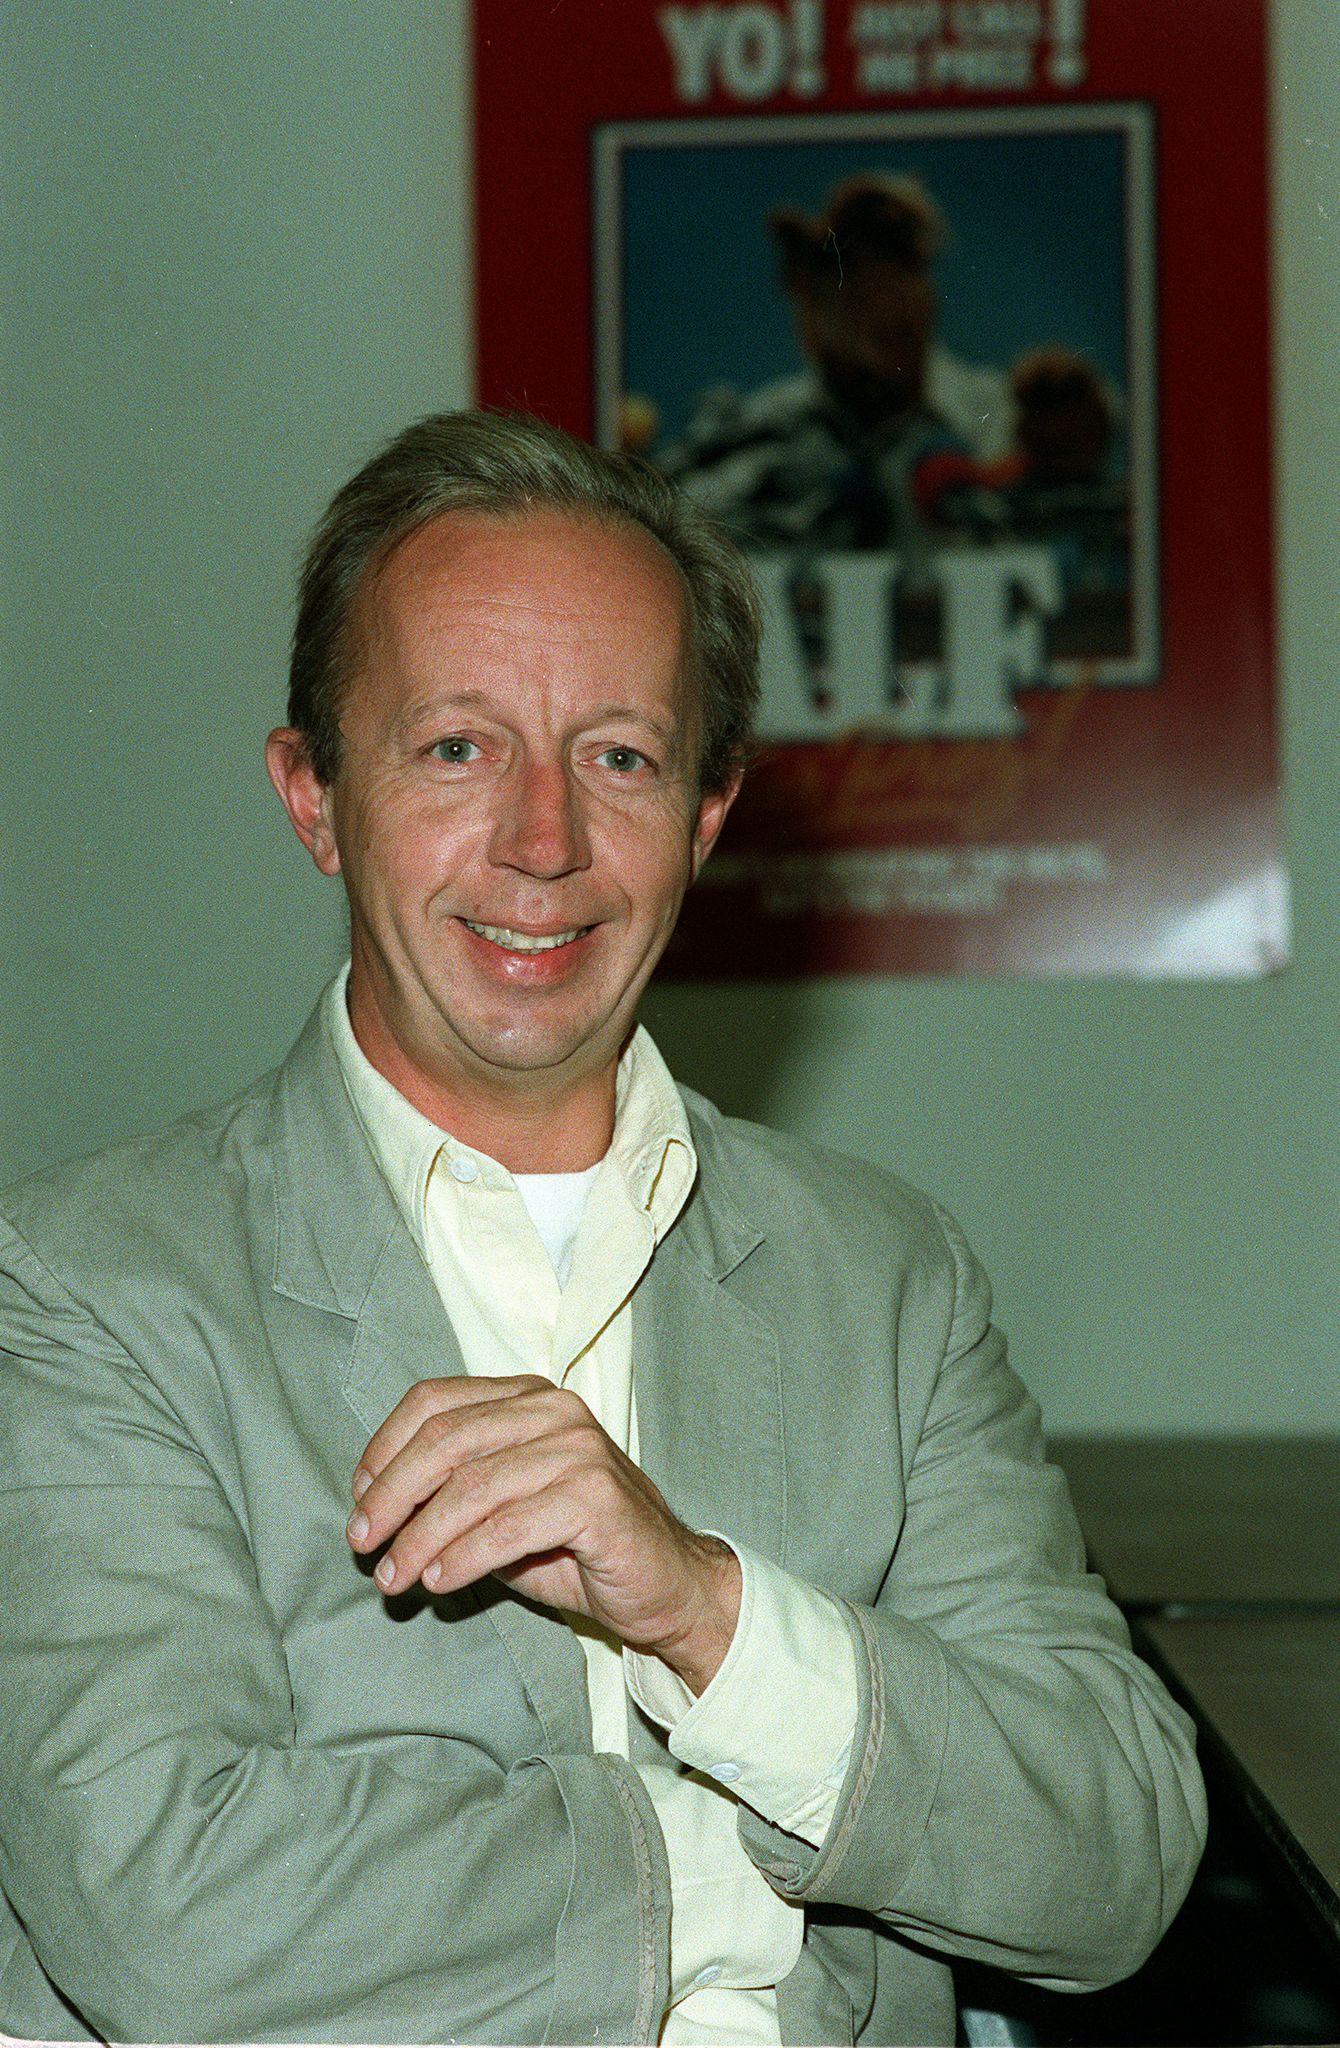 Max Wright, 'Alf' actor, dies at 75